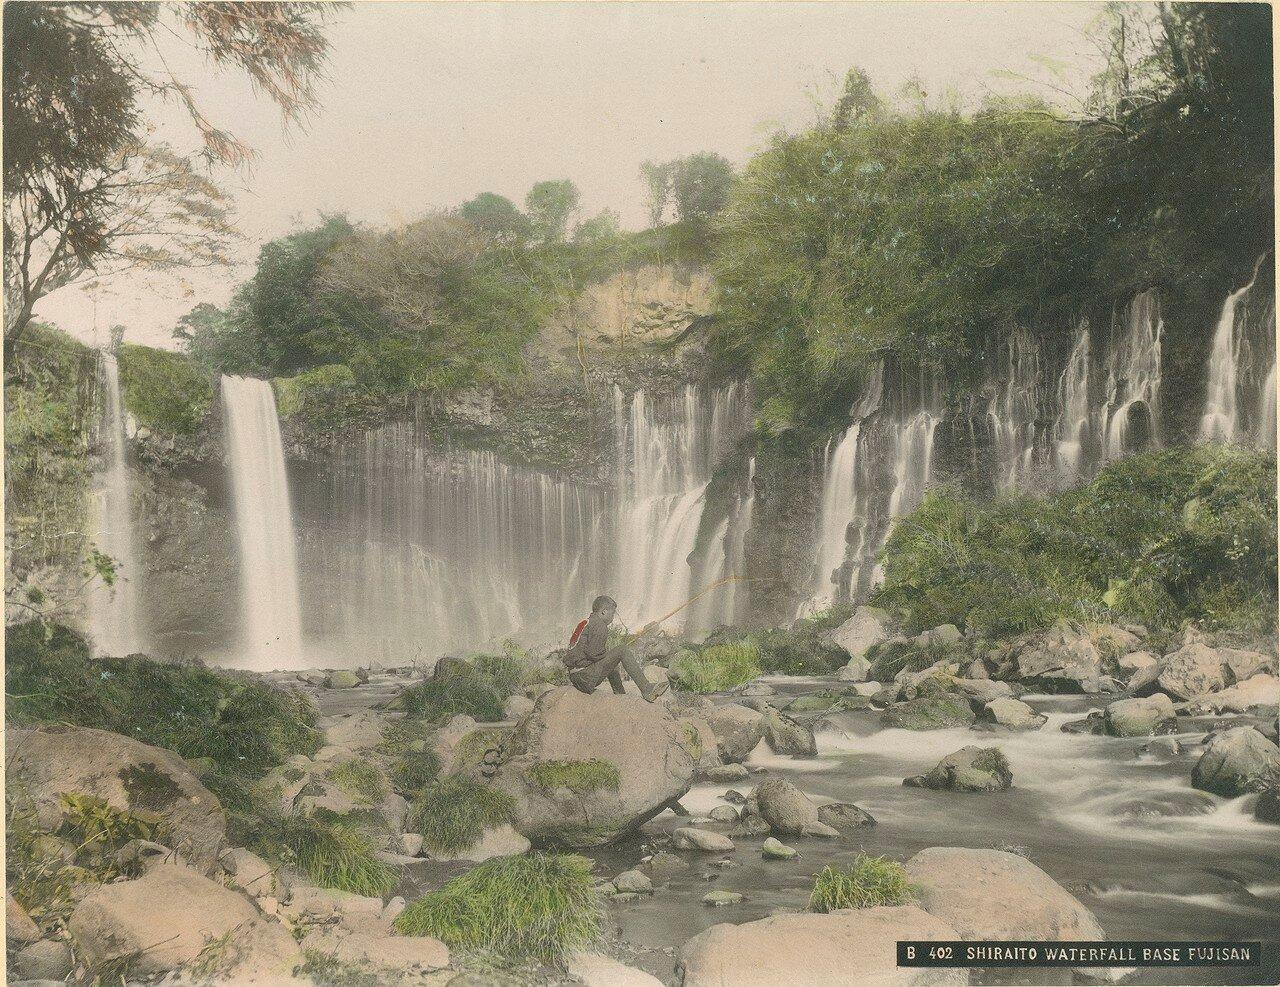 Водопад Шираито у подножия Фудзиямы